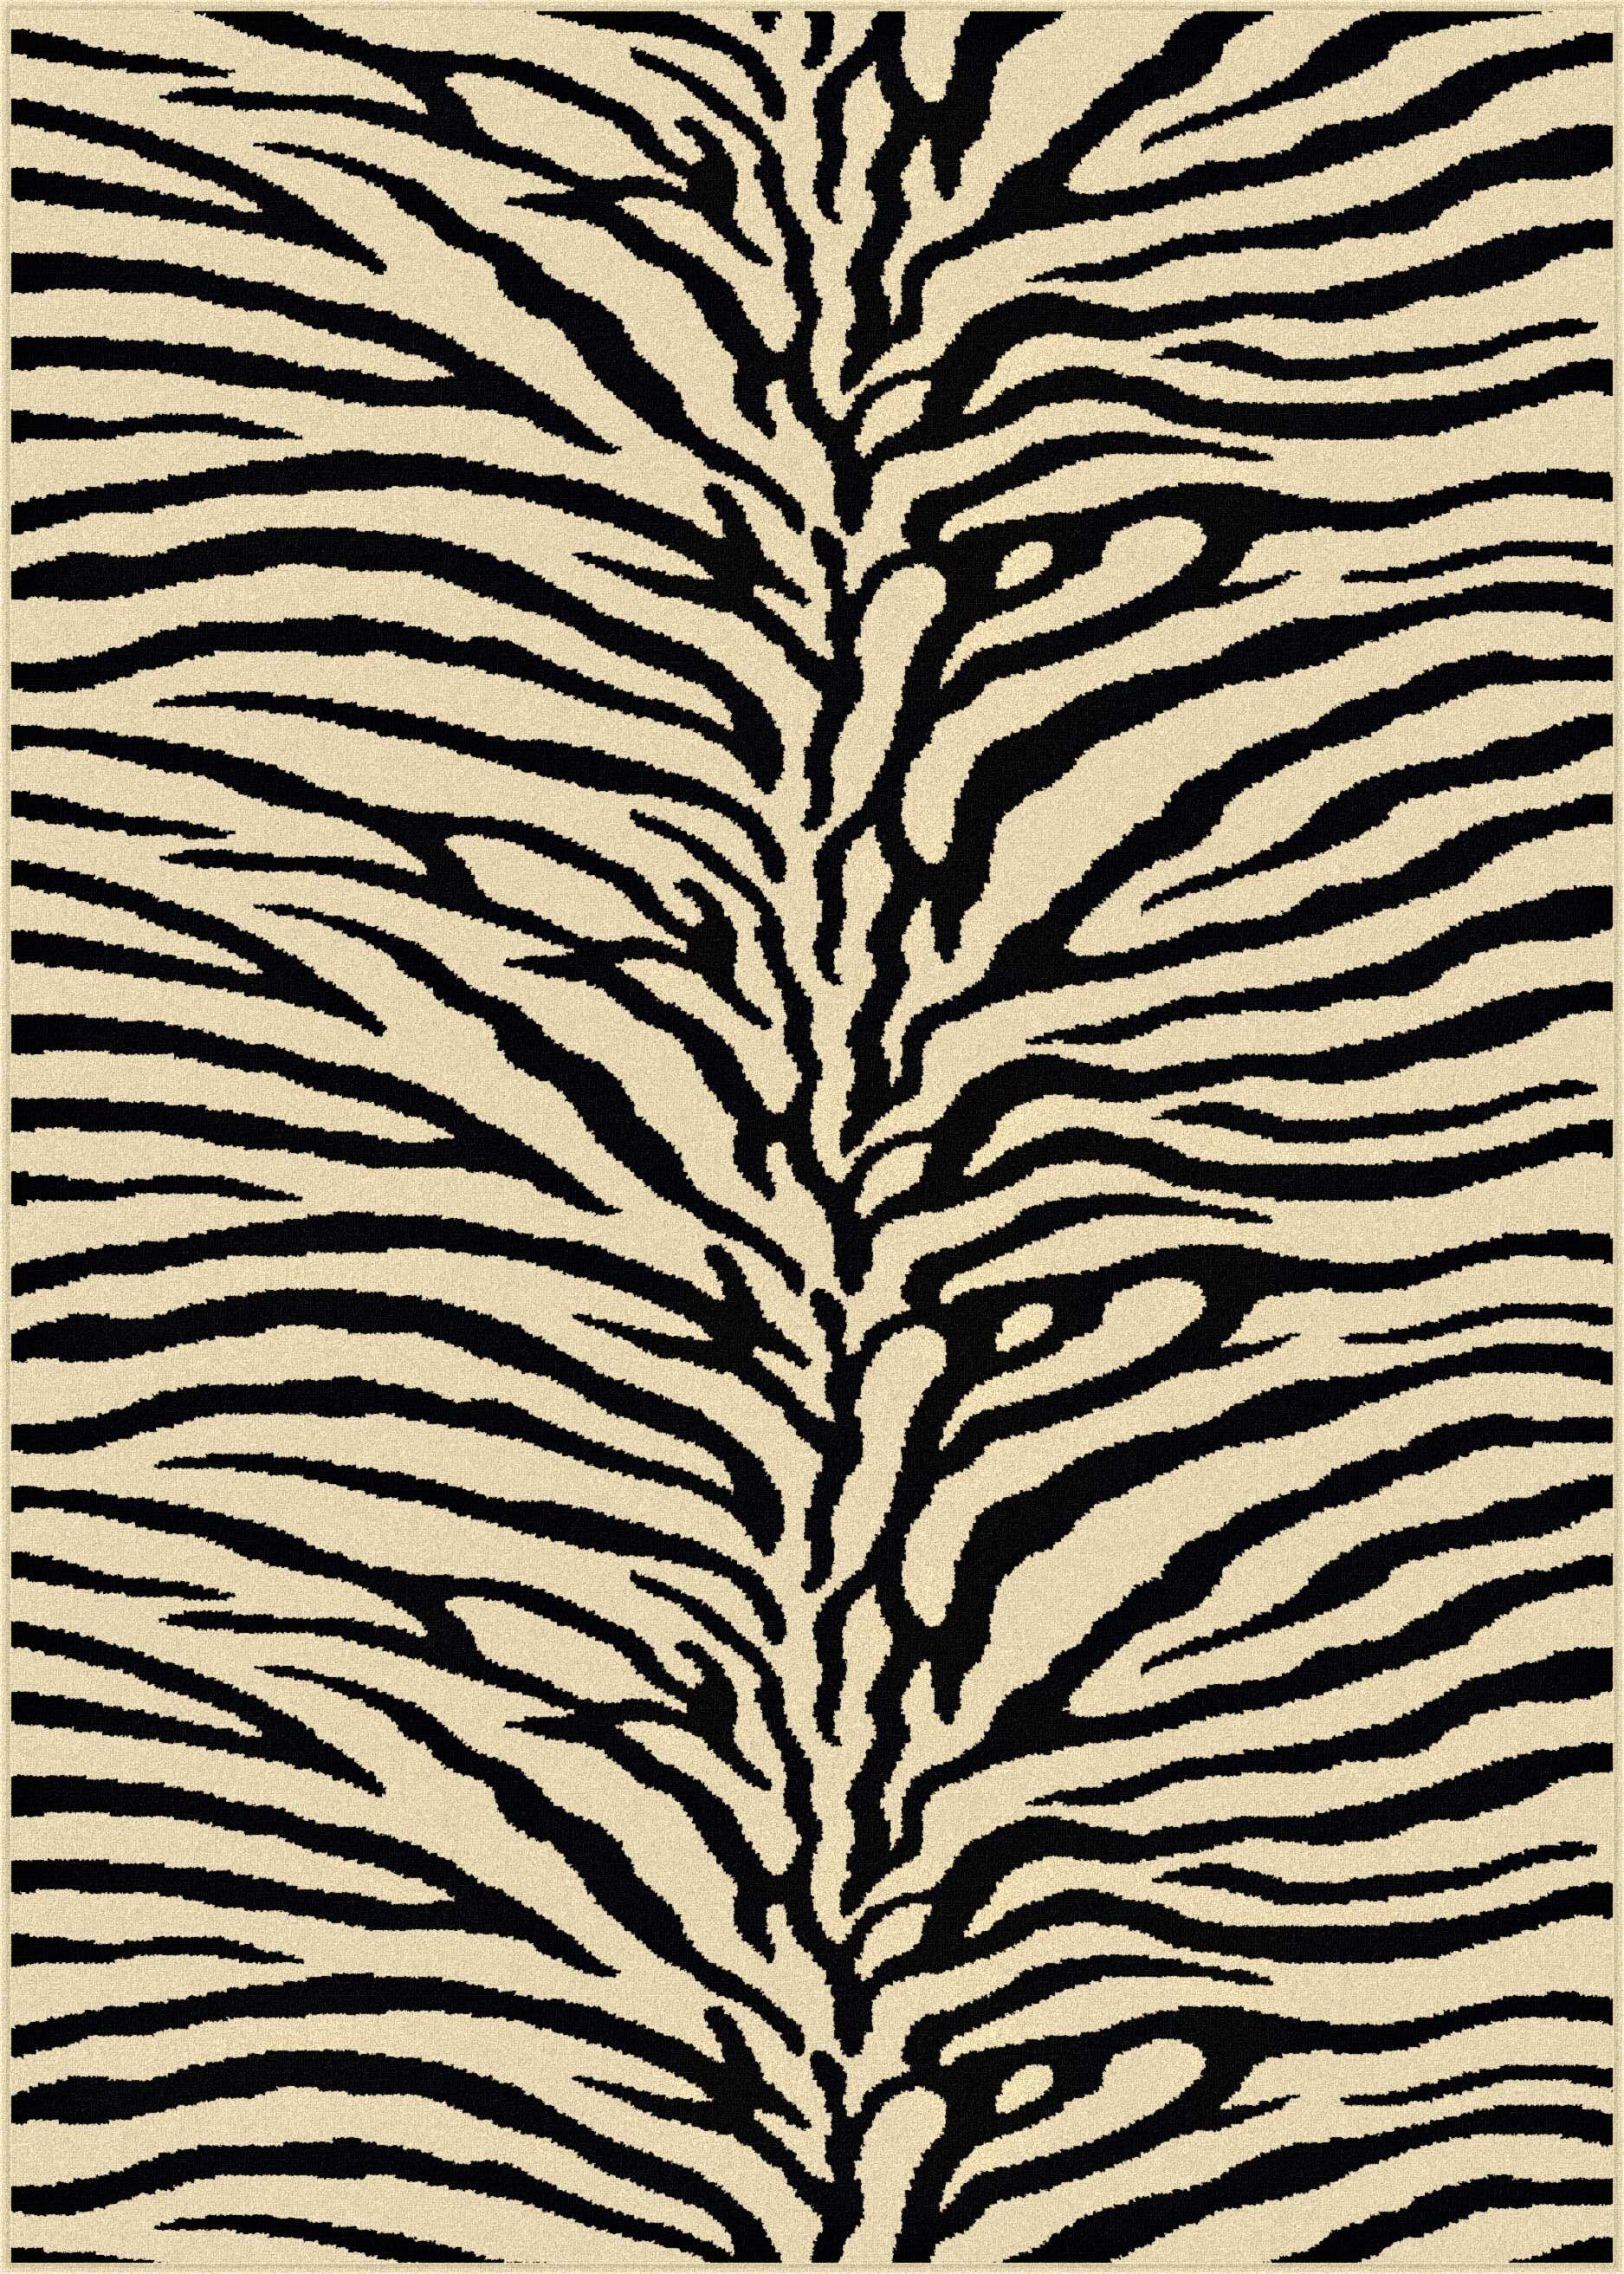 Pembroke Pines Beige Animal Oval Area Rug Rug Size: 7'10'' Round